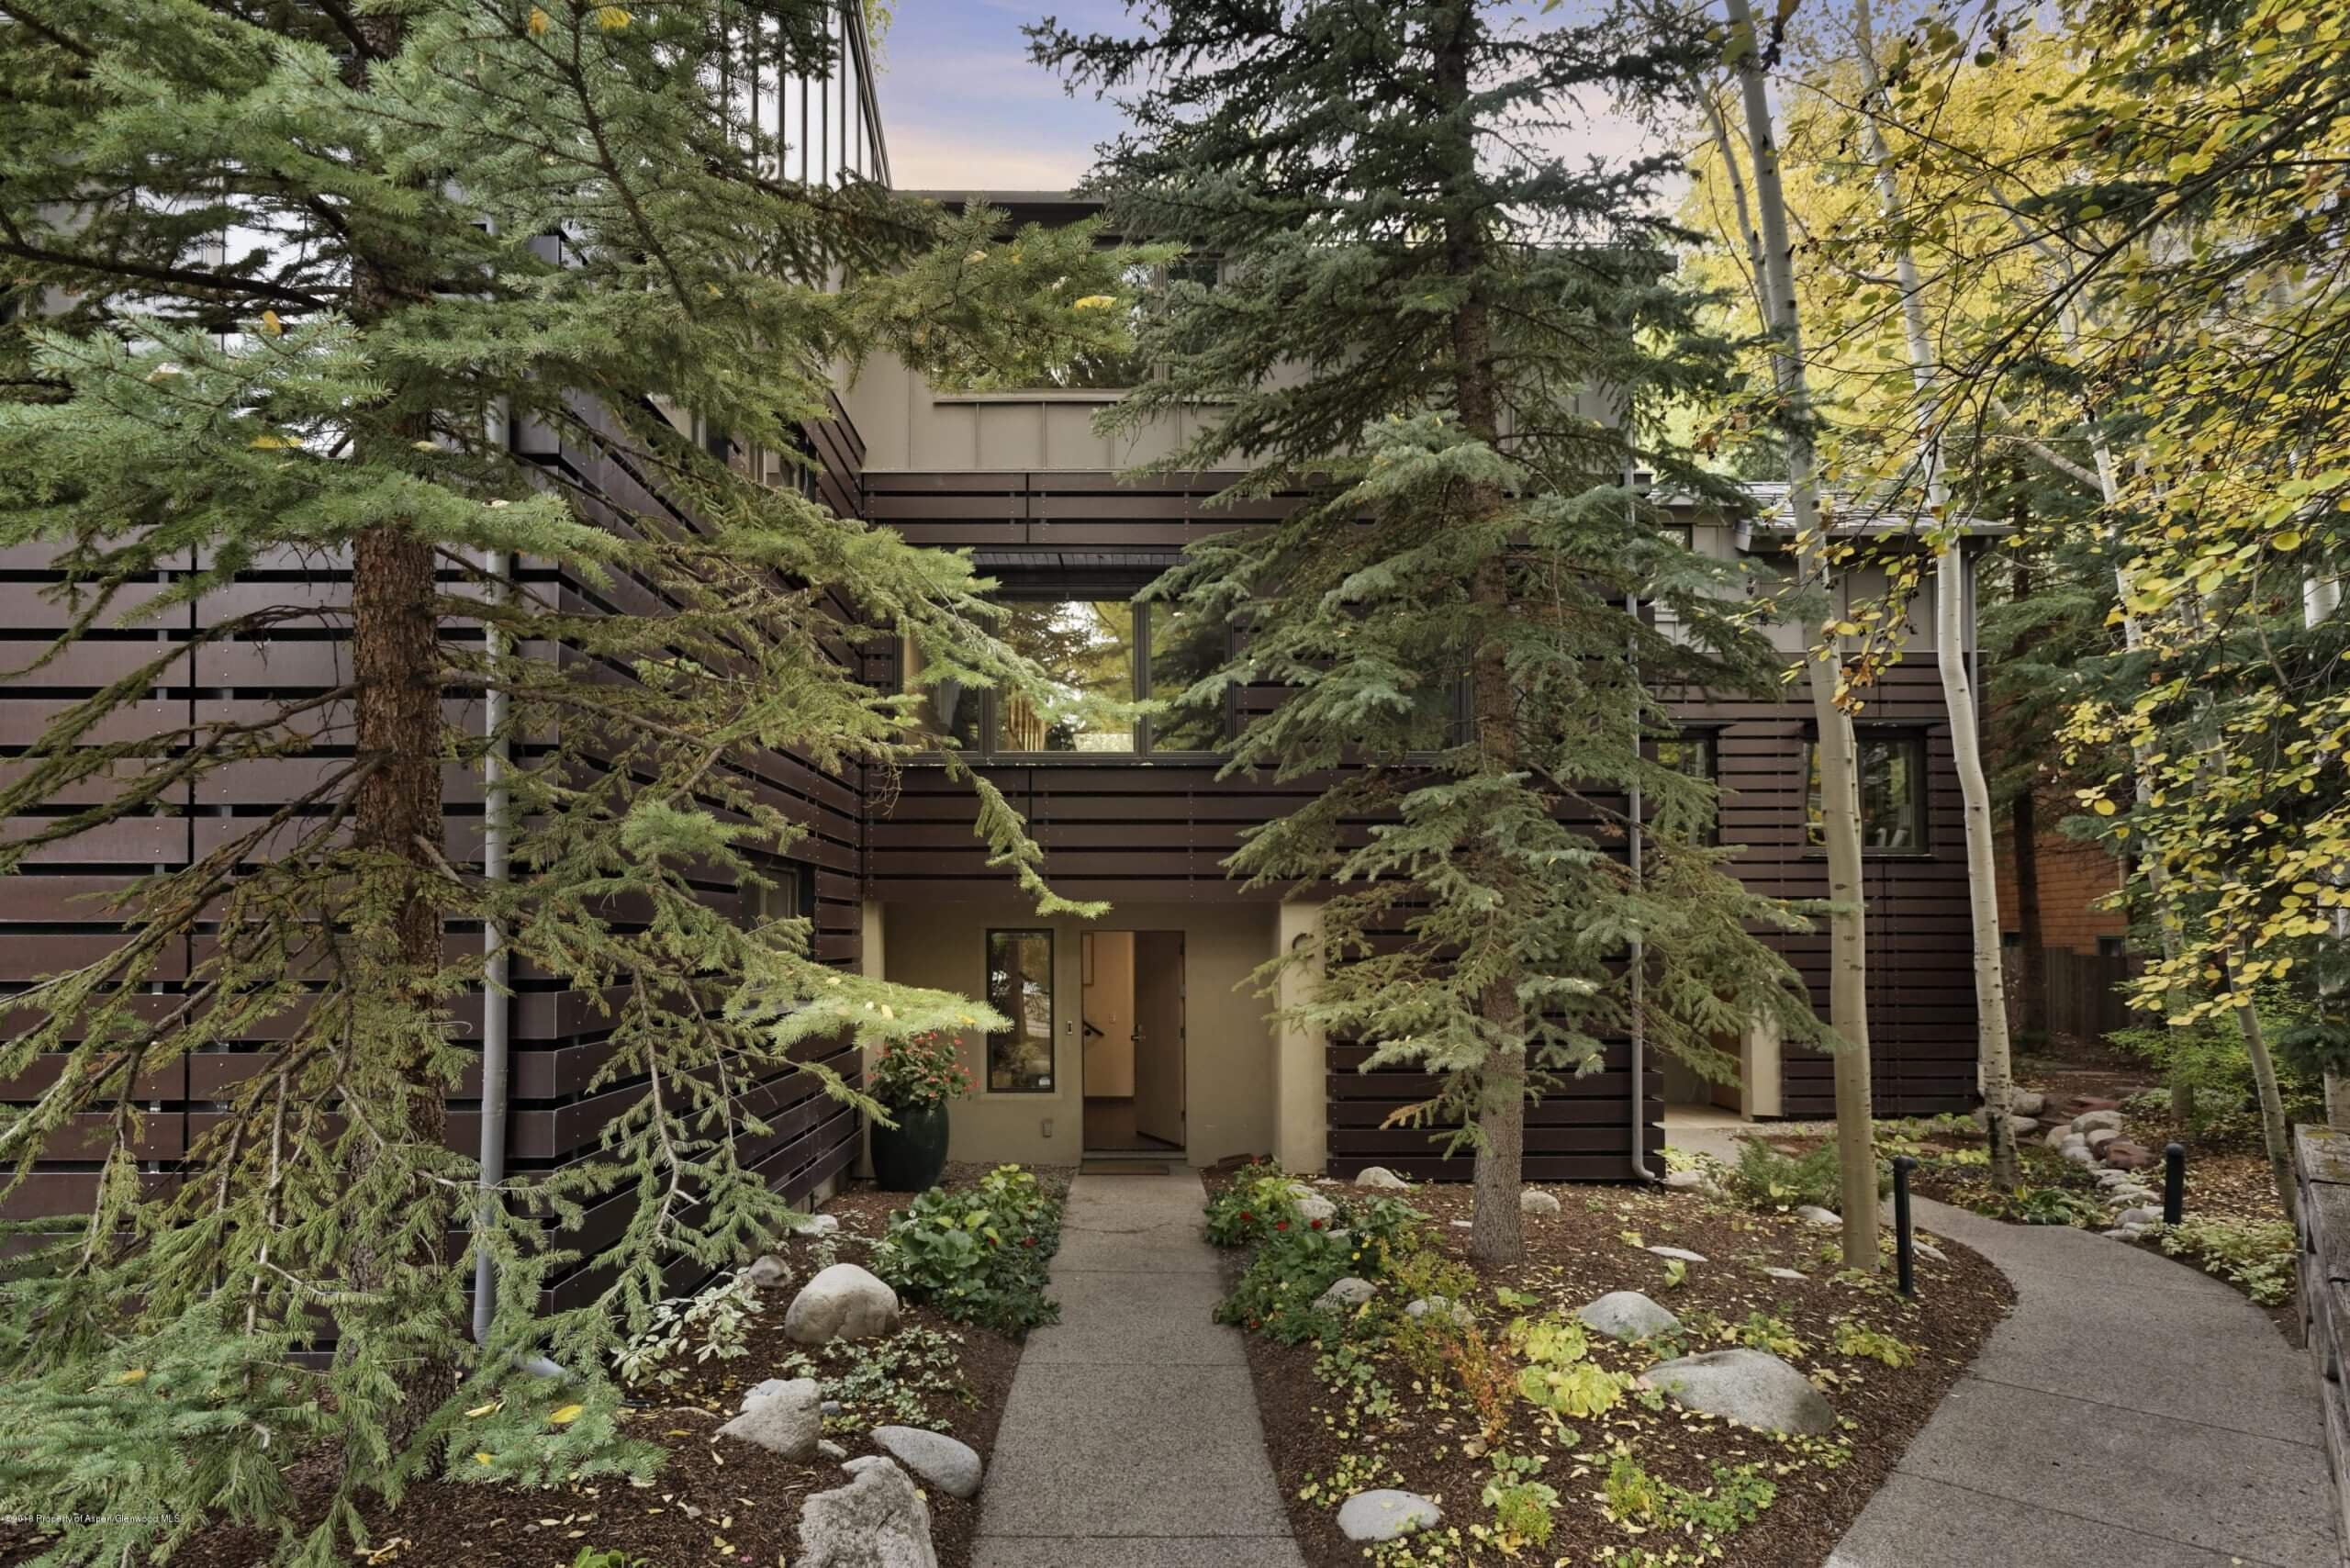 Black Swan Townhome at 851 Ute Ave #C Sells at $4.525M/$1,923 SF Furn Image